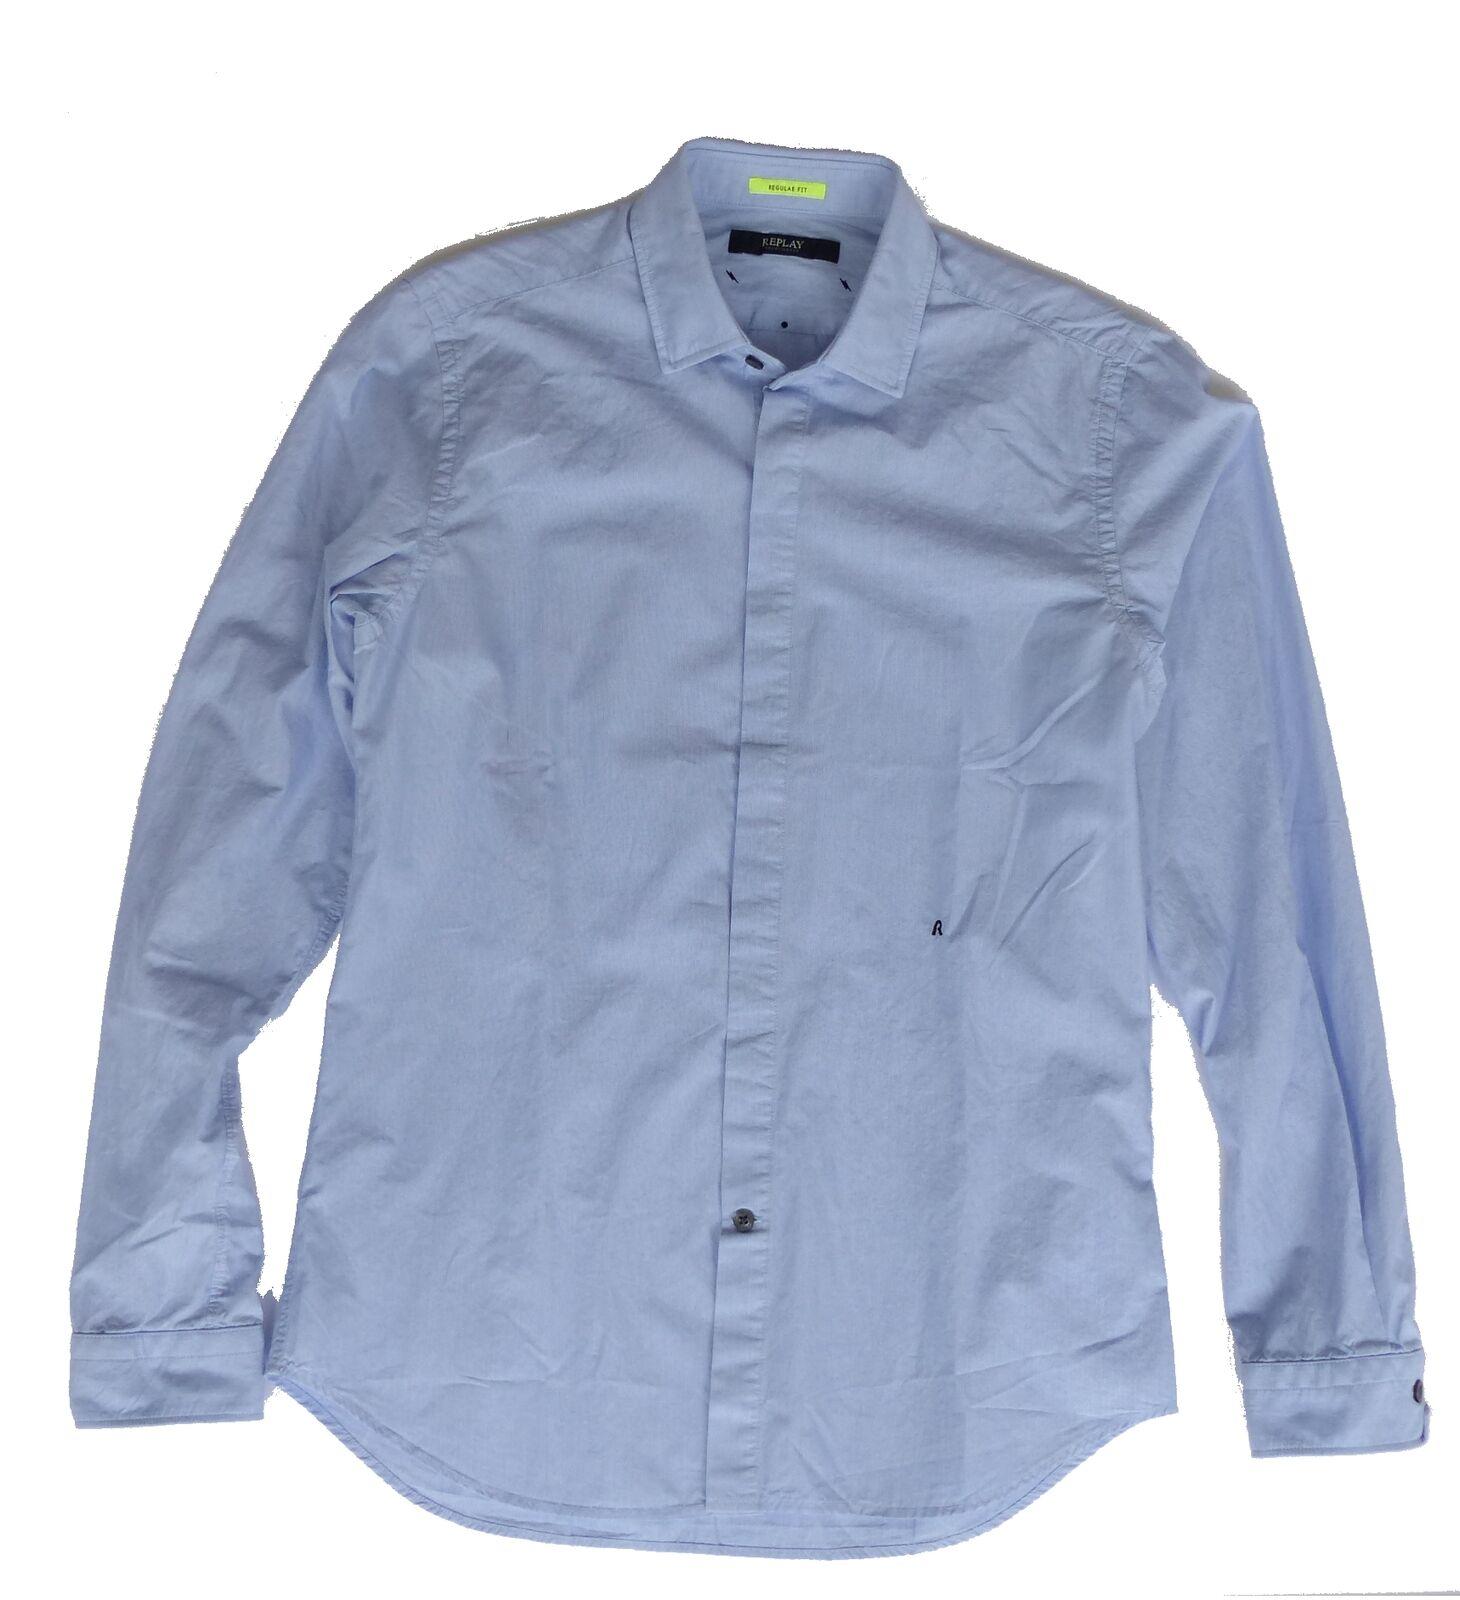 Replay M4921 L S Shirt, Sky bluee